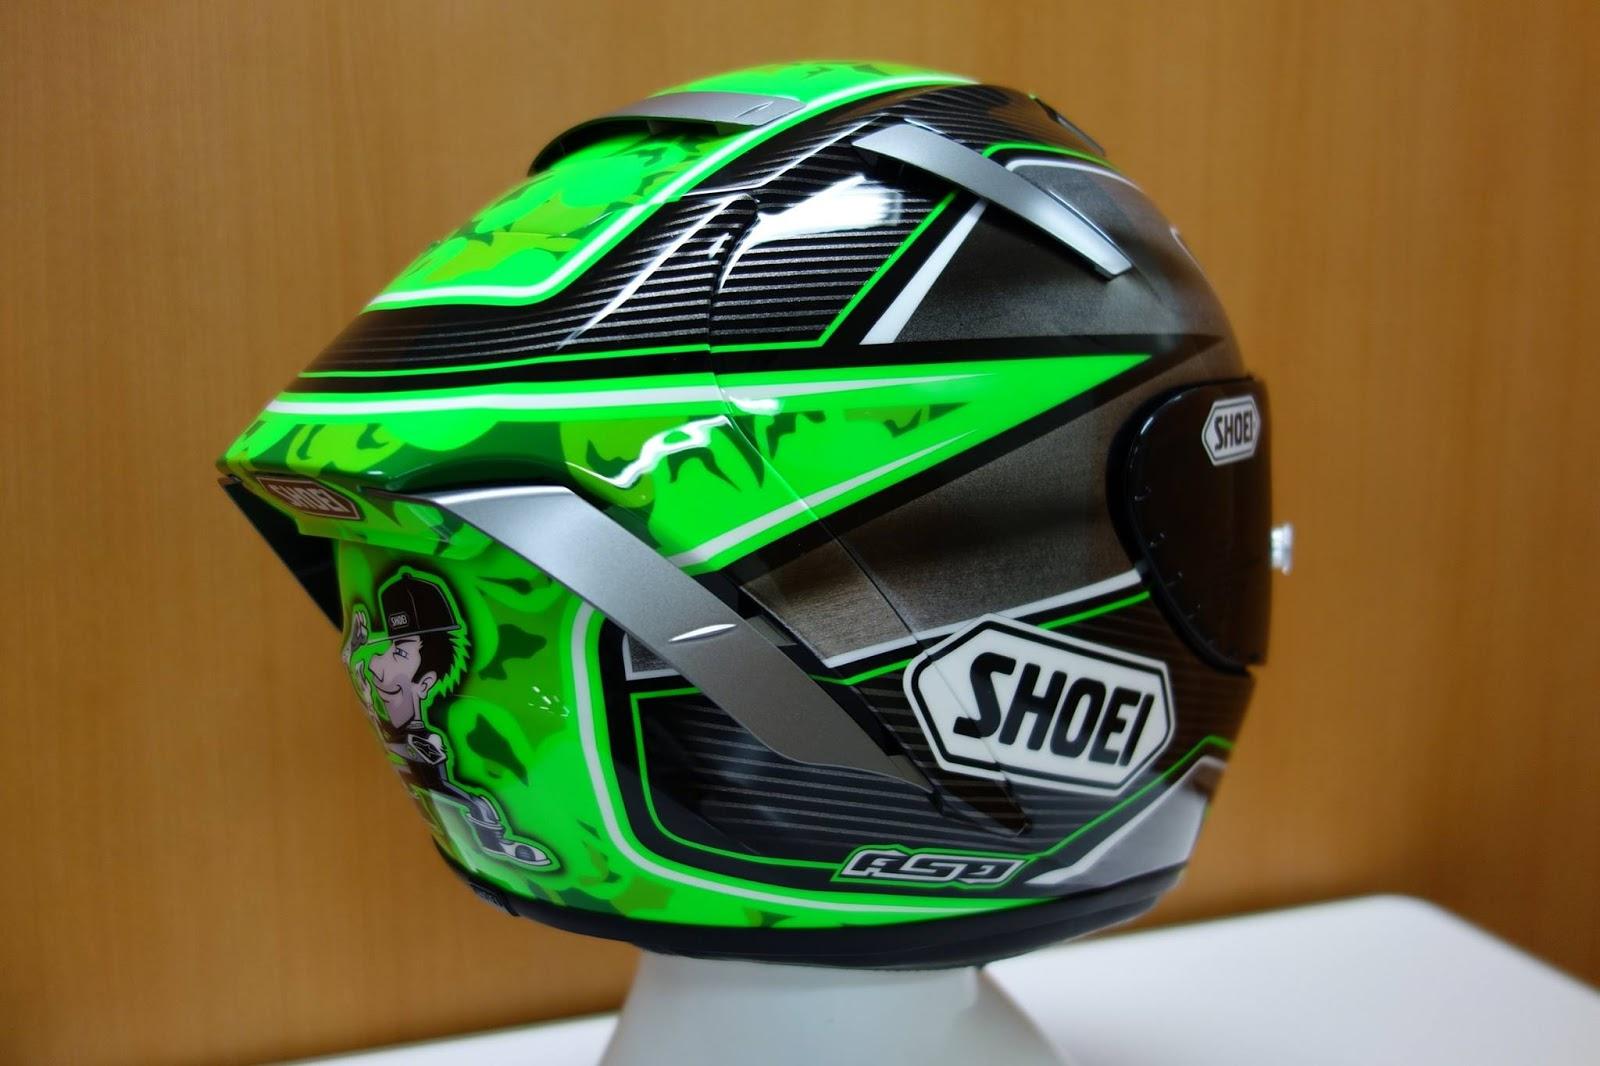 Racing Helmets Garage: Shoei X-Spirit III E.Laverty 2016 by ASD - painted by Shoei